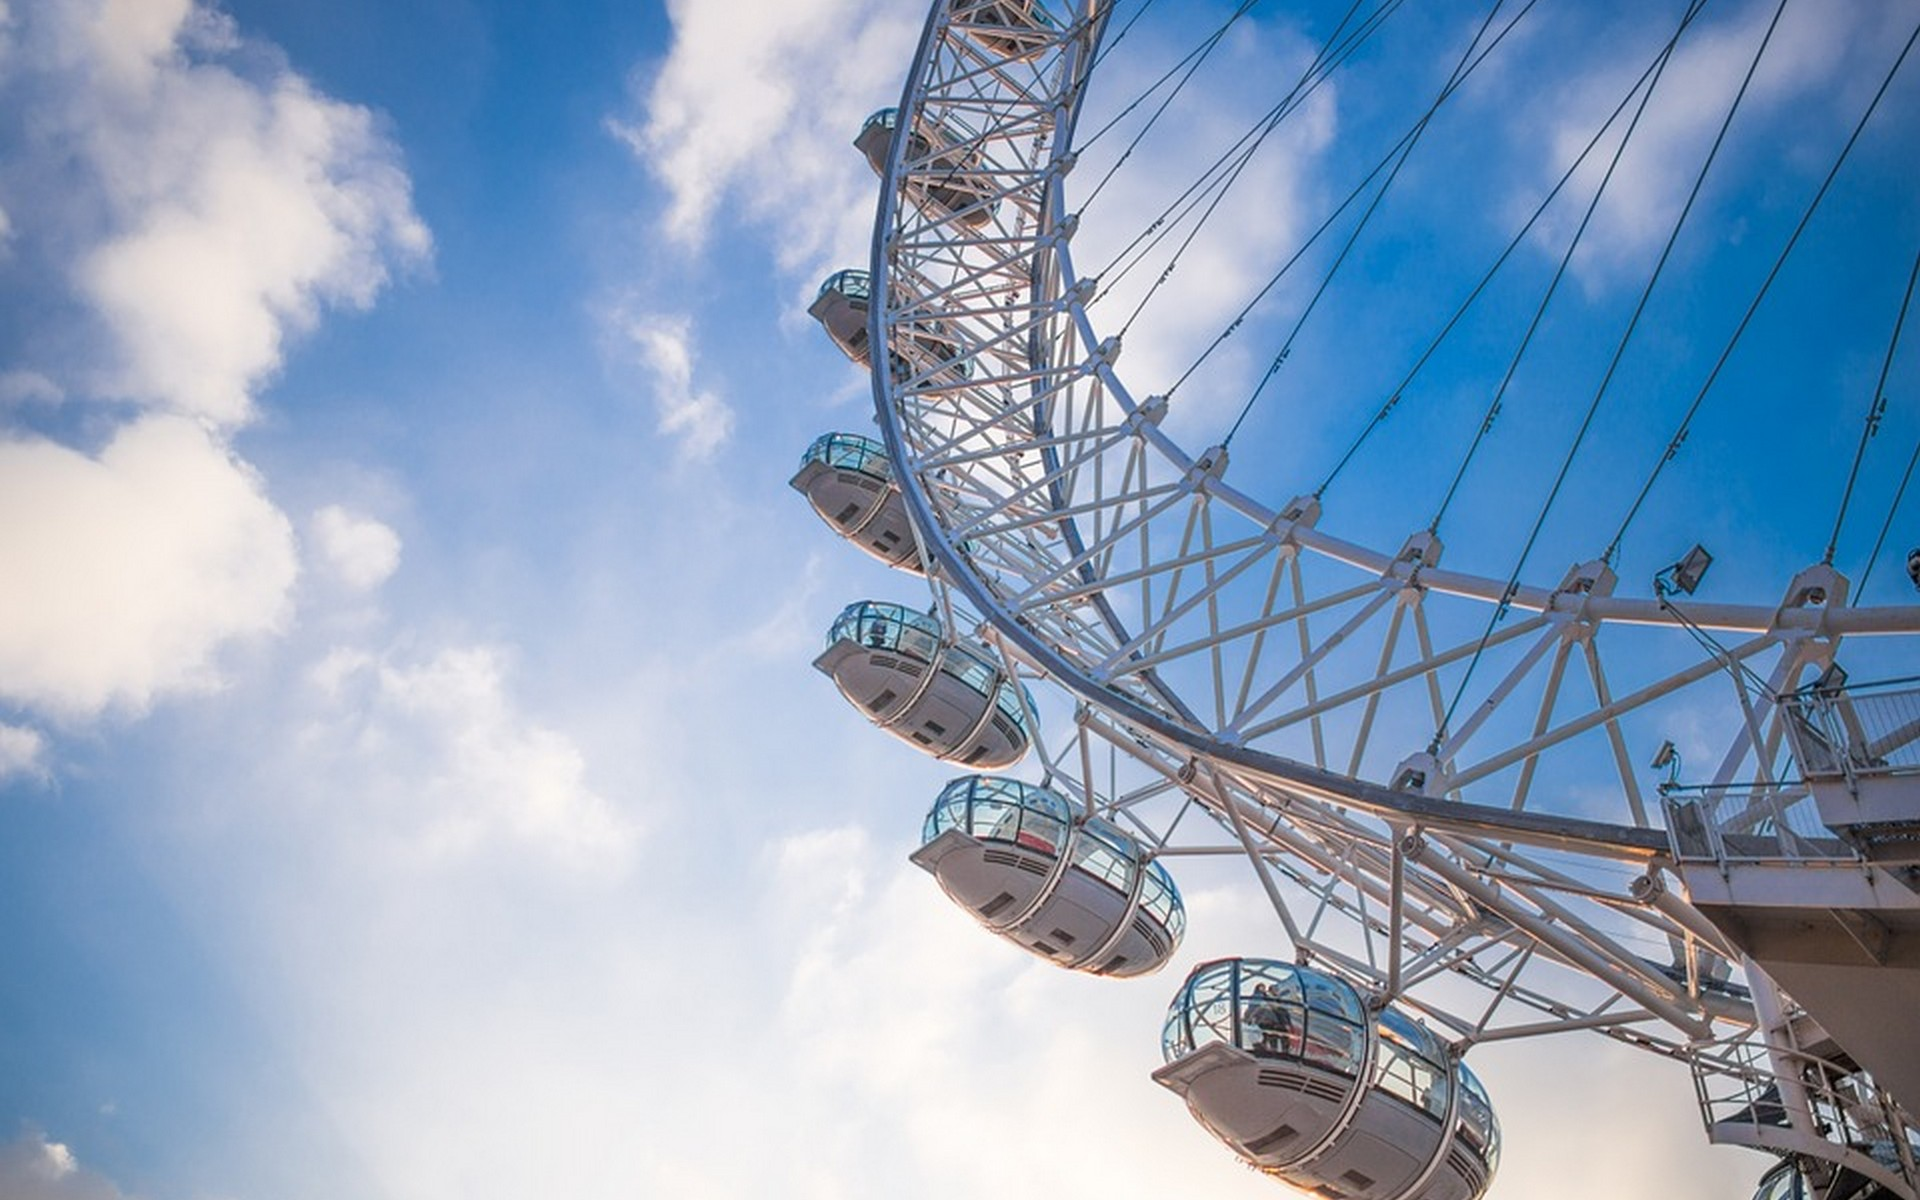 The London Eye, Millennium Wheel